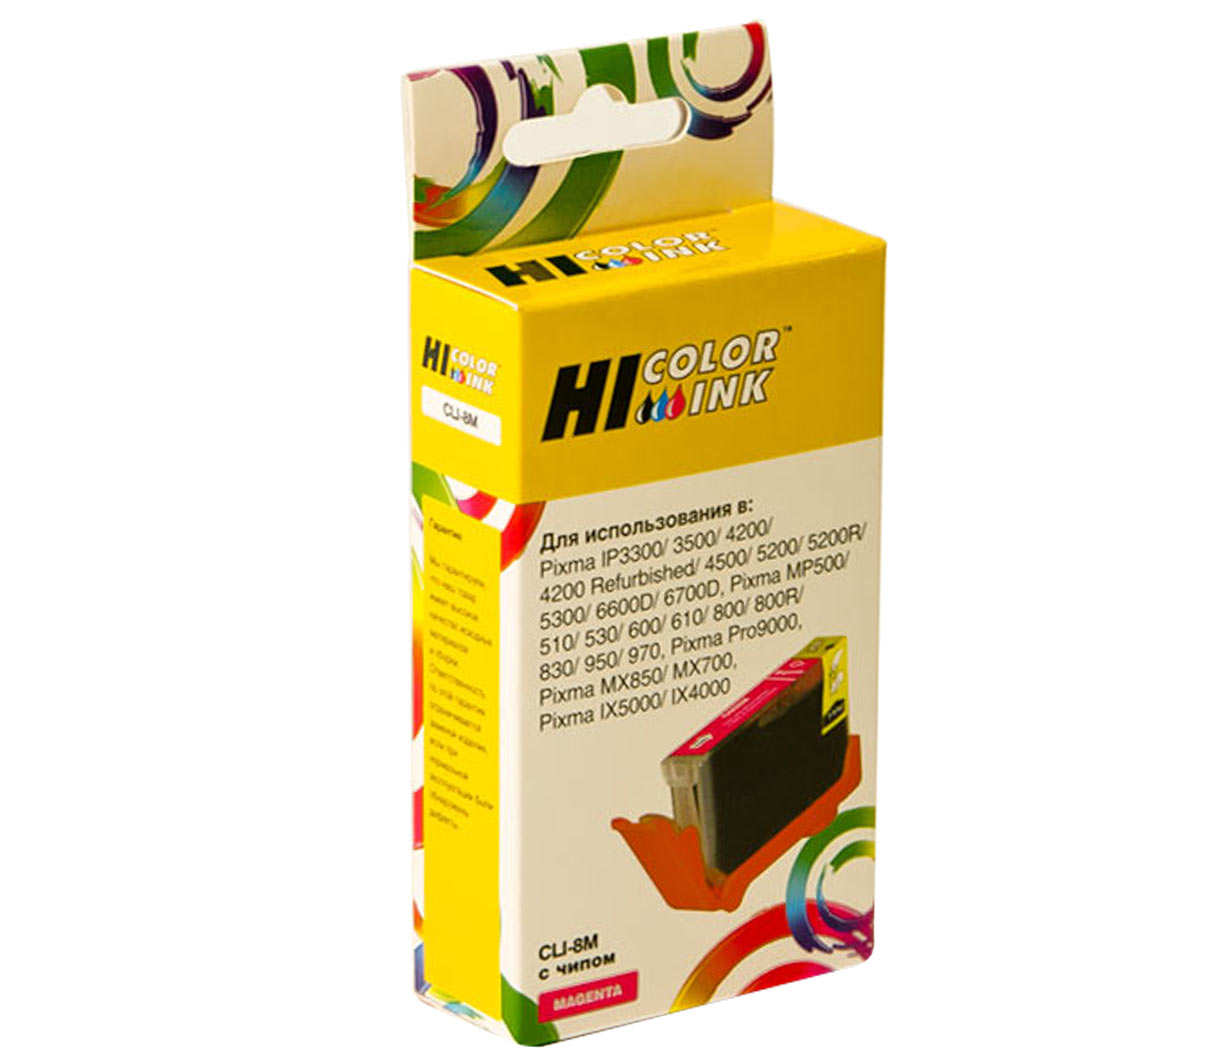 Картридж Hi-Black (HB-CLI-8M) для Canon PIXMA iP4200/iP6600D/MP500, M